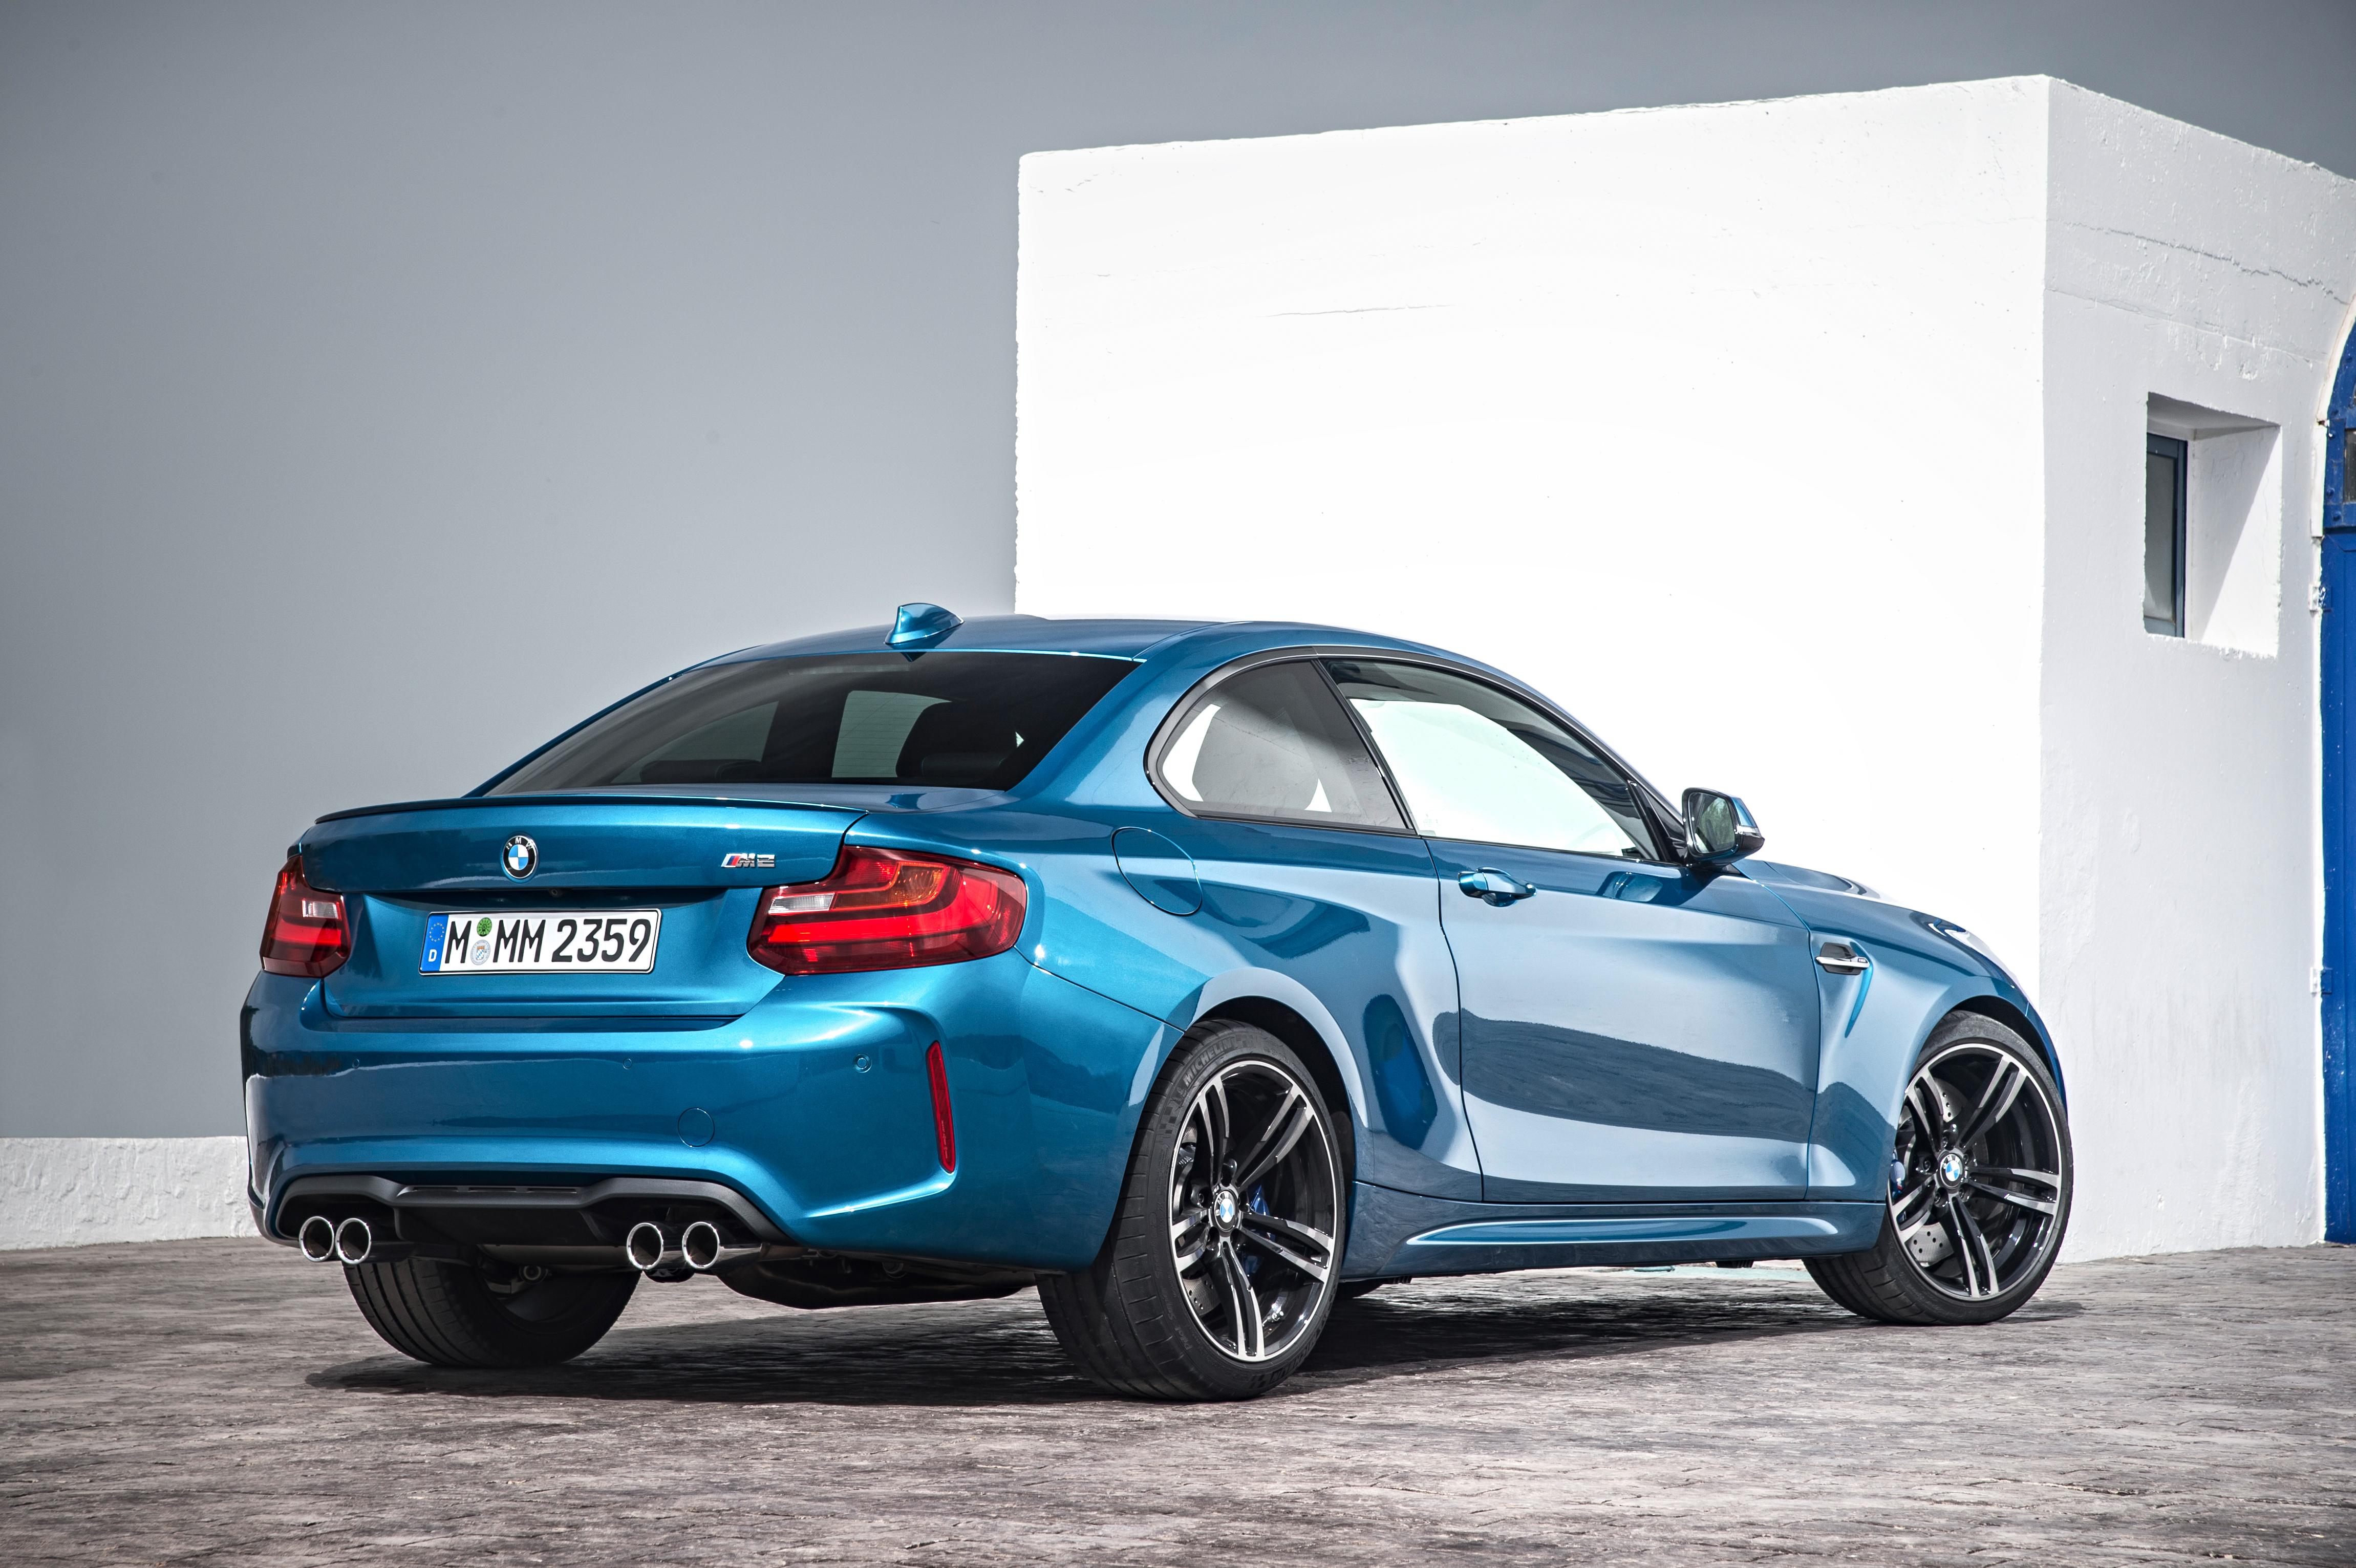 BMW M2 Coupé 4